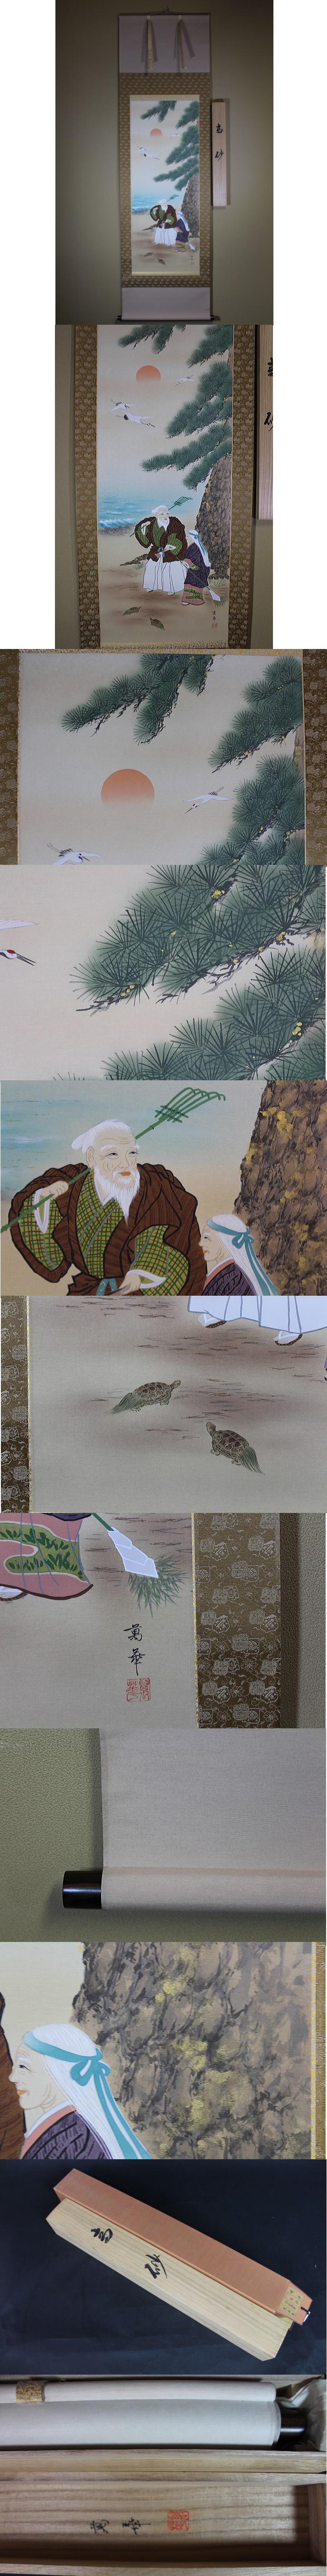 jikutakasagoyosida